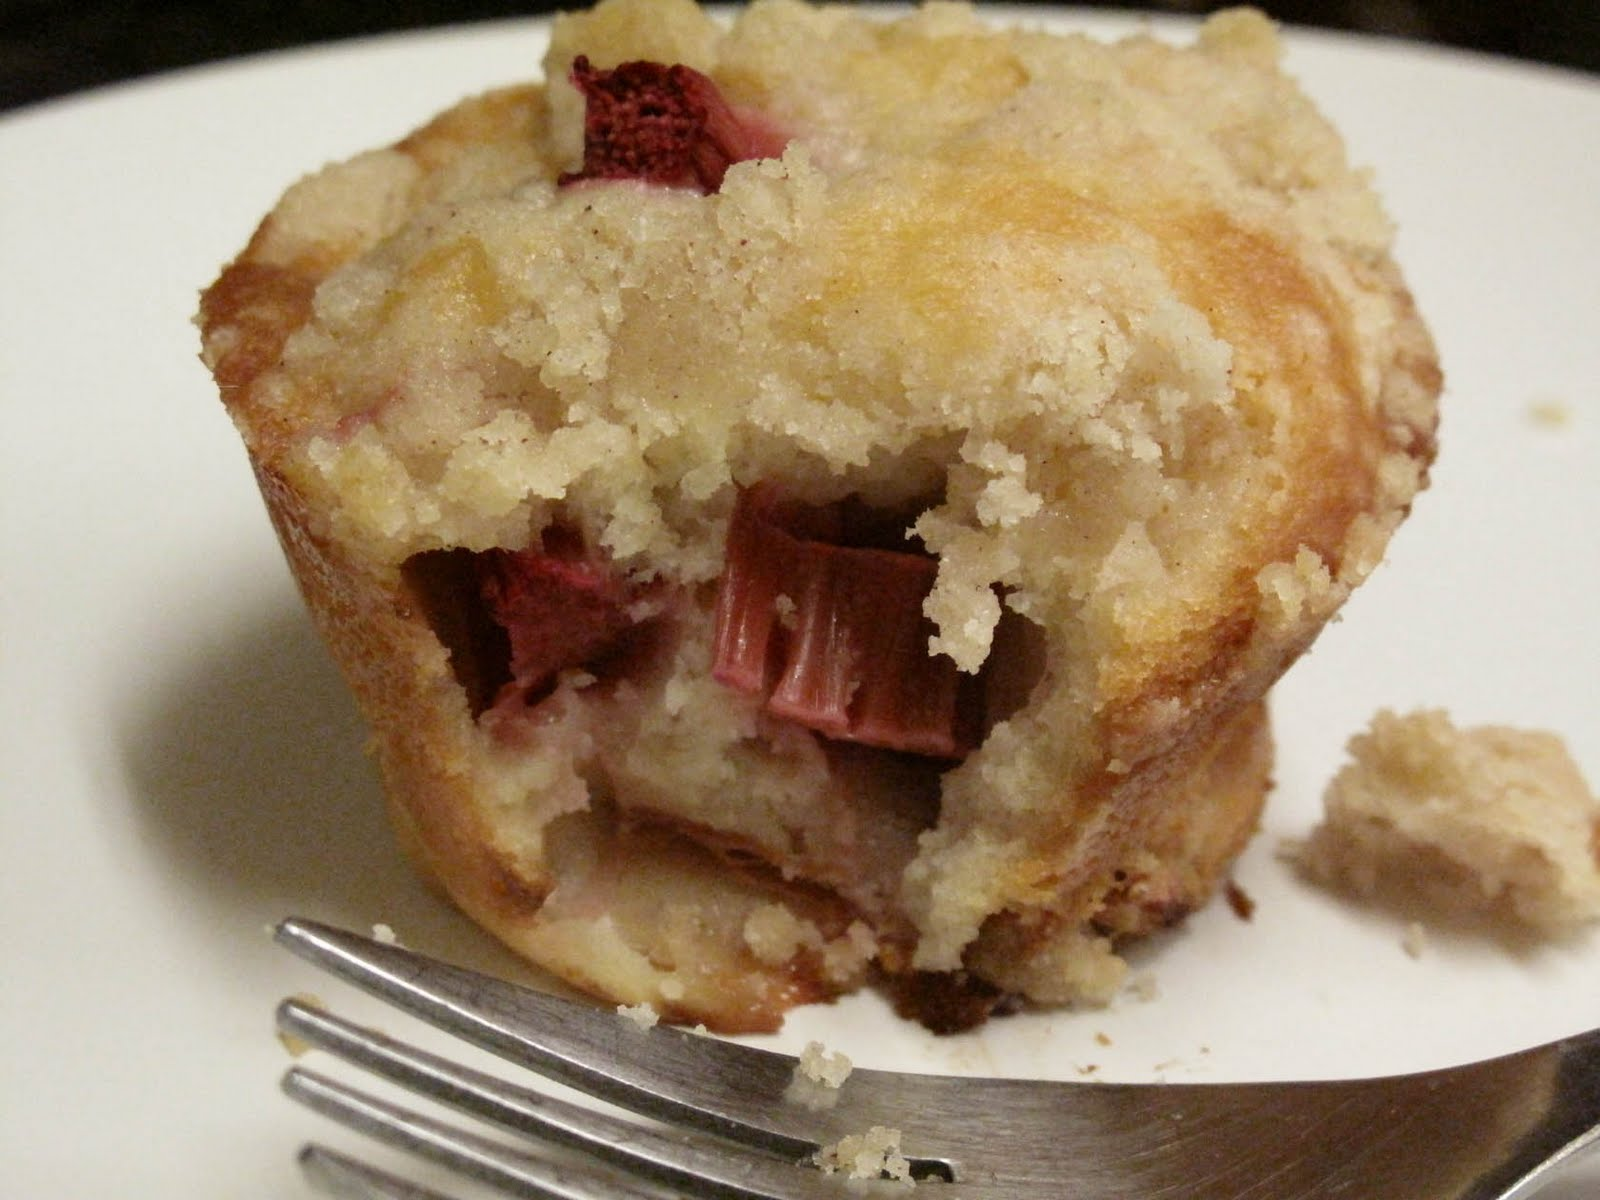 Oh Eat Dirt: Rhubarb Muffins